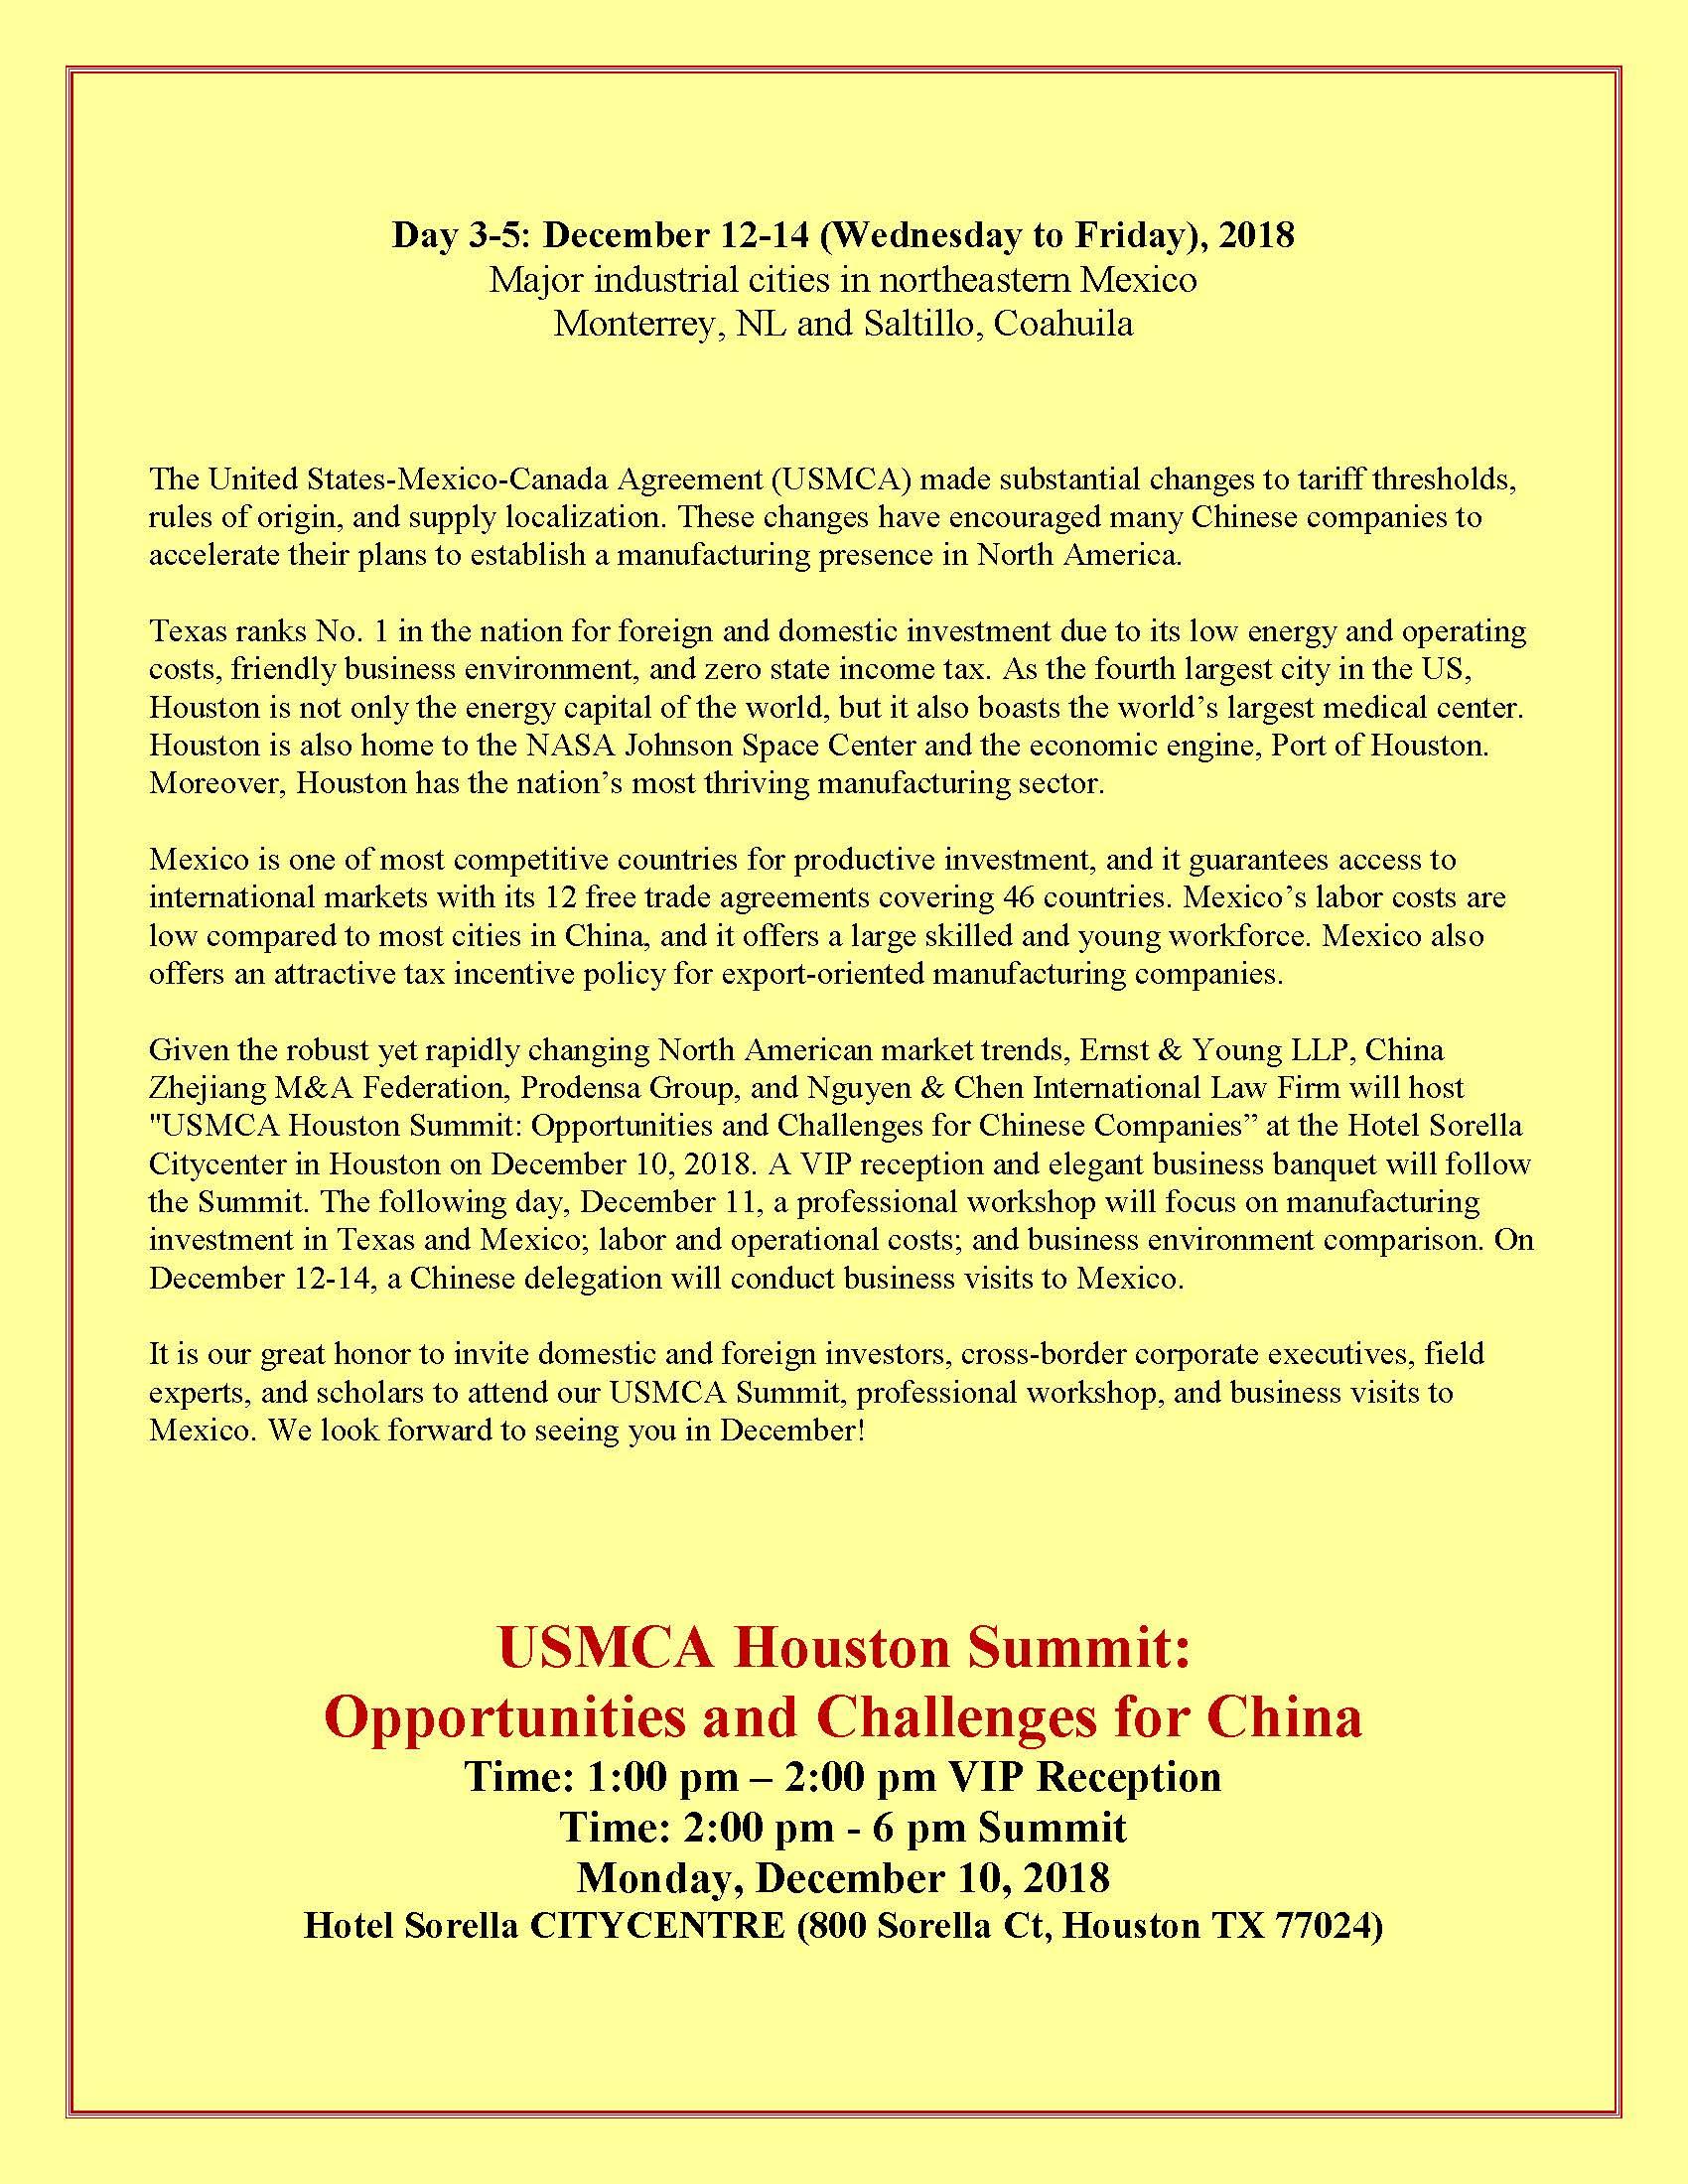 USMAC Summit Invitation English_181126_kn_Page_2